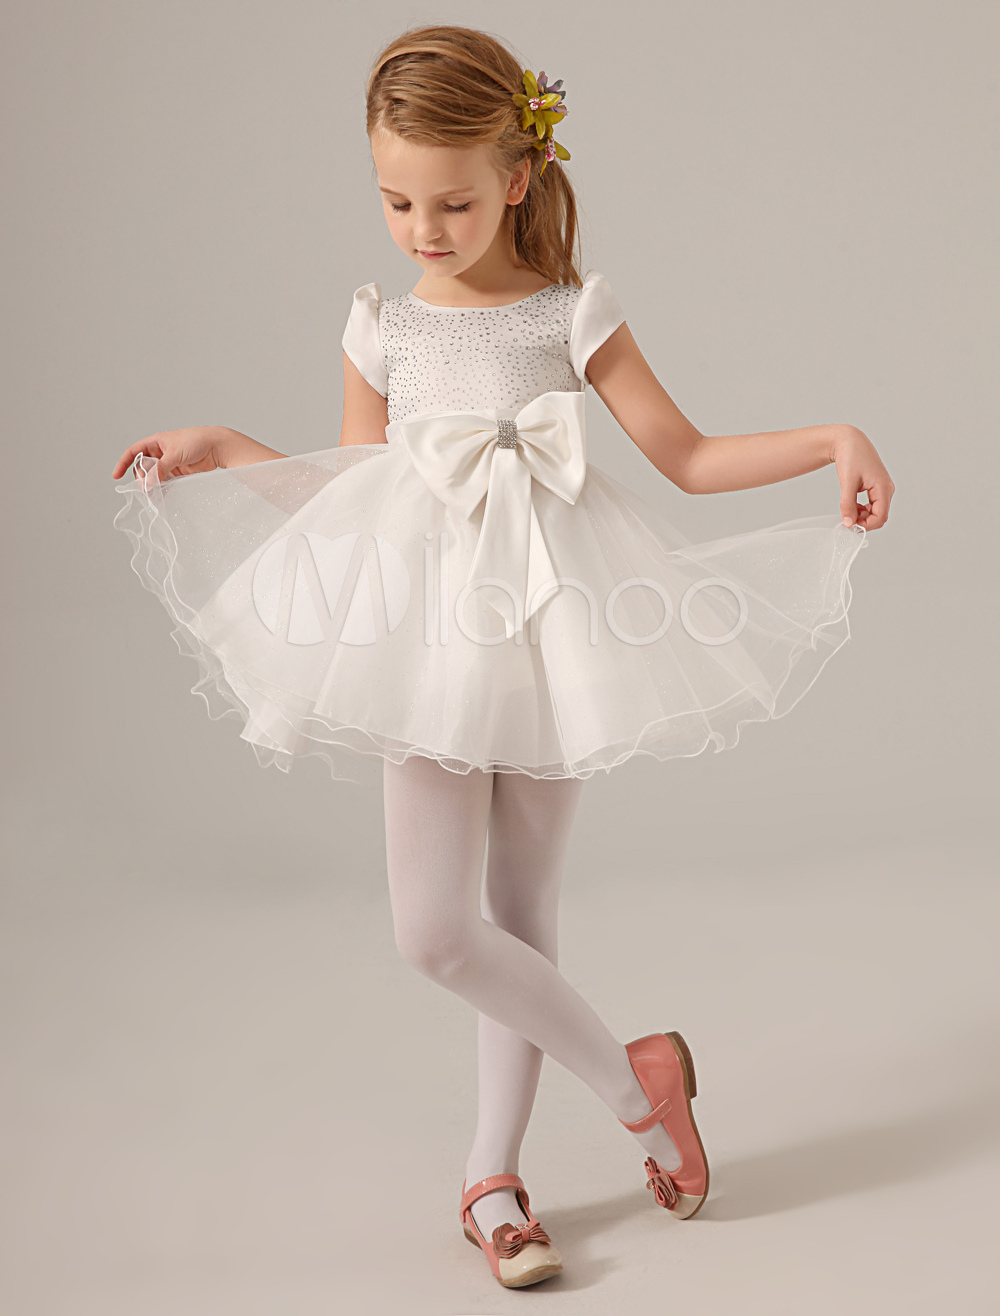 White Jewel Neck Bow Organza Lovely Flower Girl Dress